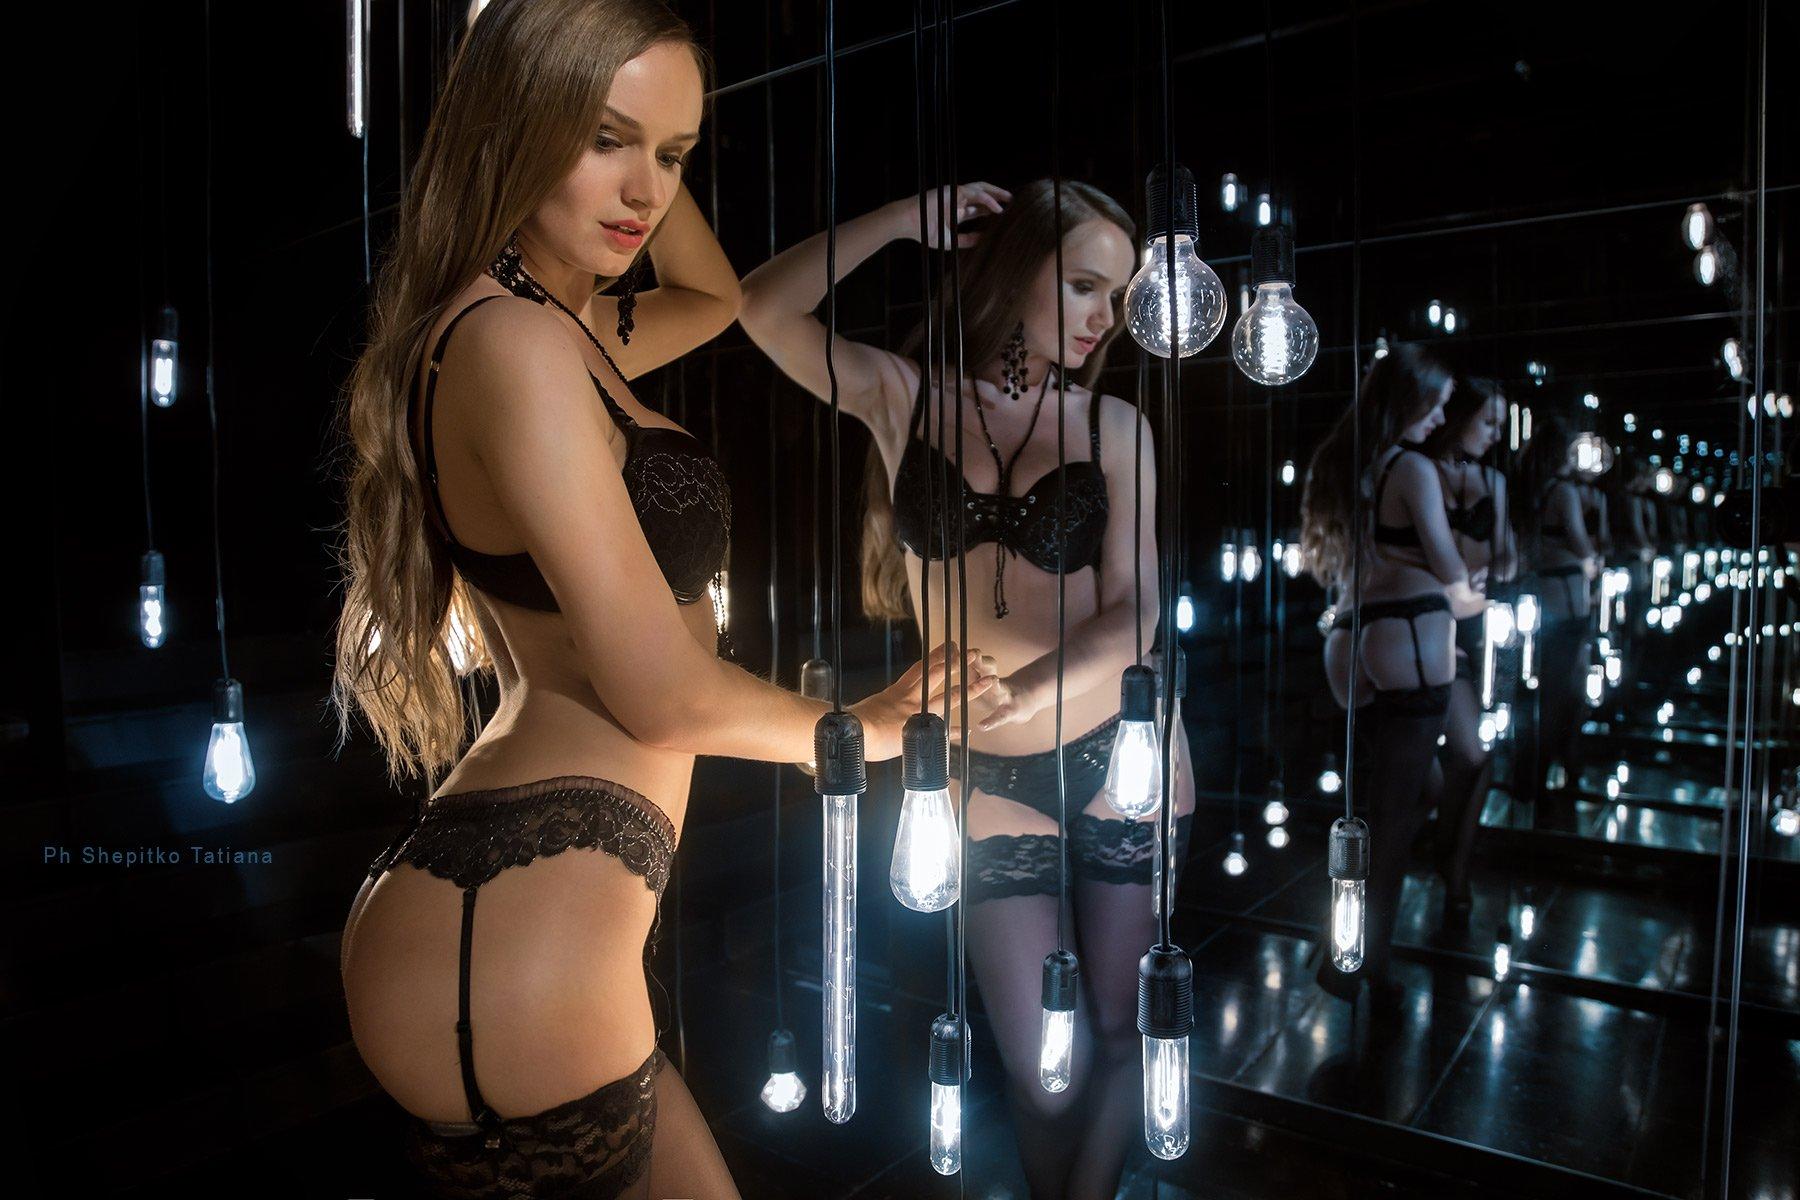 шепитько shepitko девушка girl будуар красота lingerie нижнее белье свет огни лампочка зеркало, Шепитько Татьяна